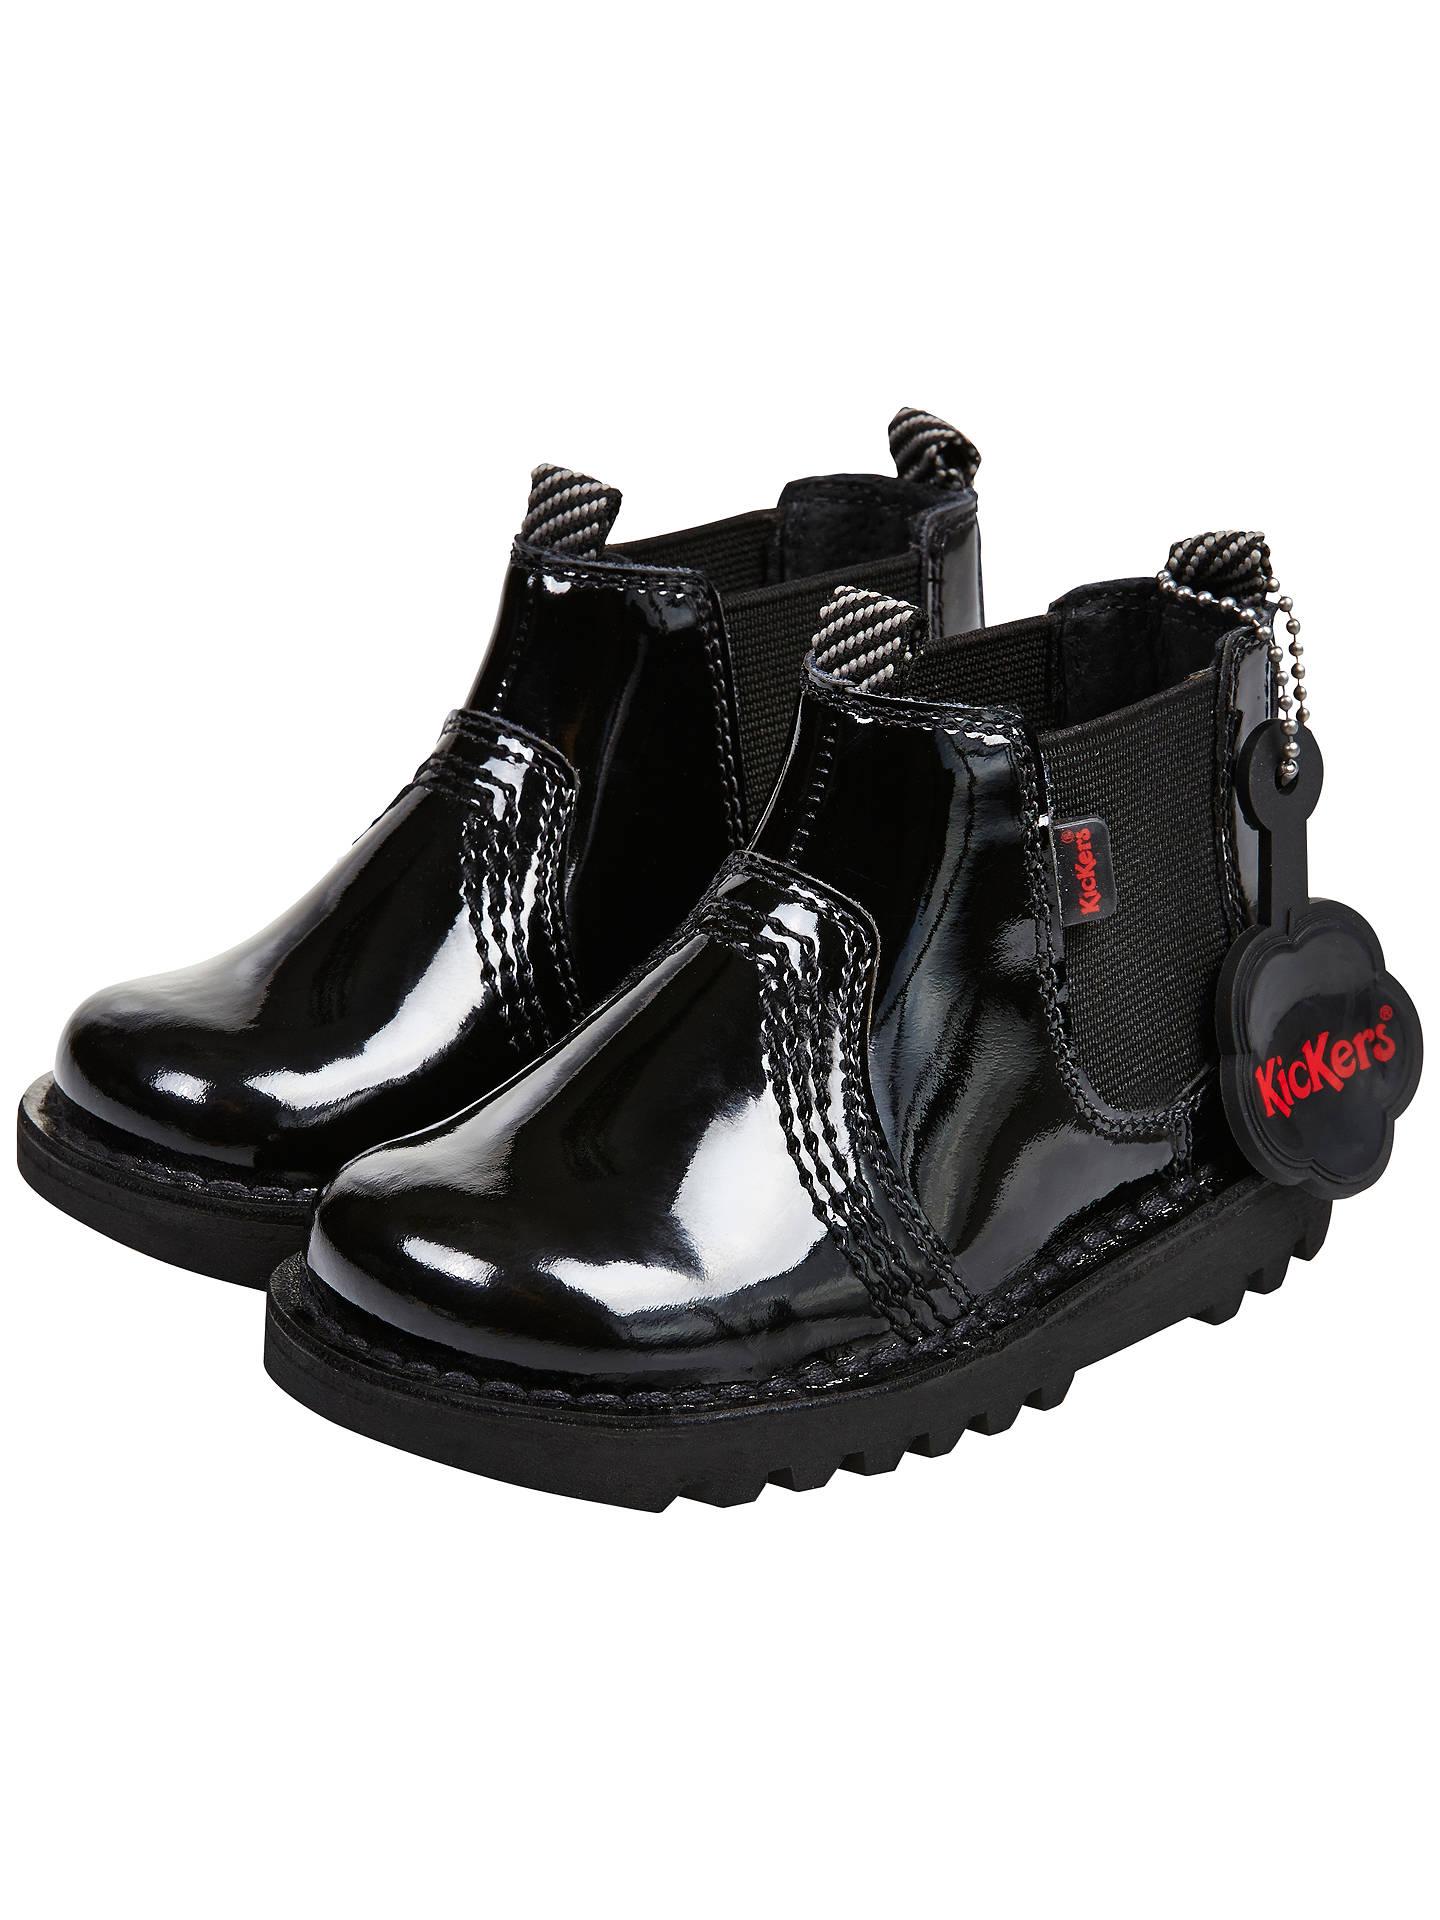 ffba5798 Buy Kickers Children's Chelsea Boots, Black Patent, 26 Online at  johnlewis.com